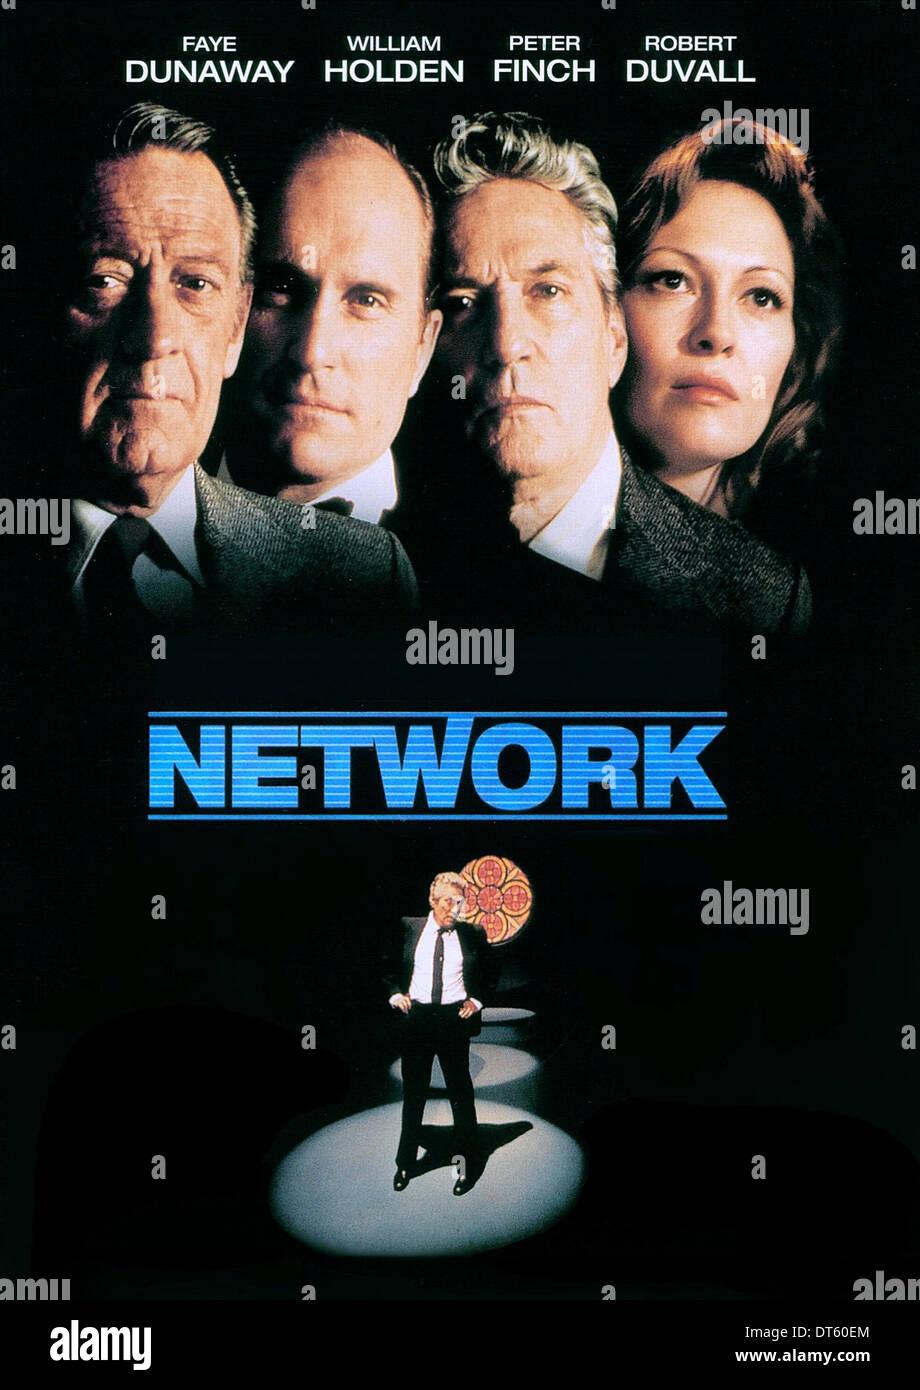 Faye dunaway network -  William Holden Robert Duvall Peter Finch Faye Dunaway Poster Network 1976 Stock